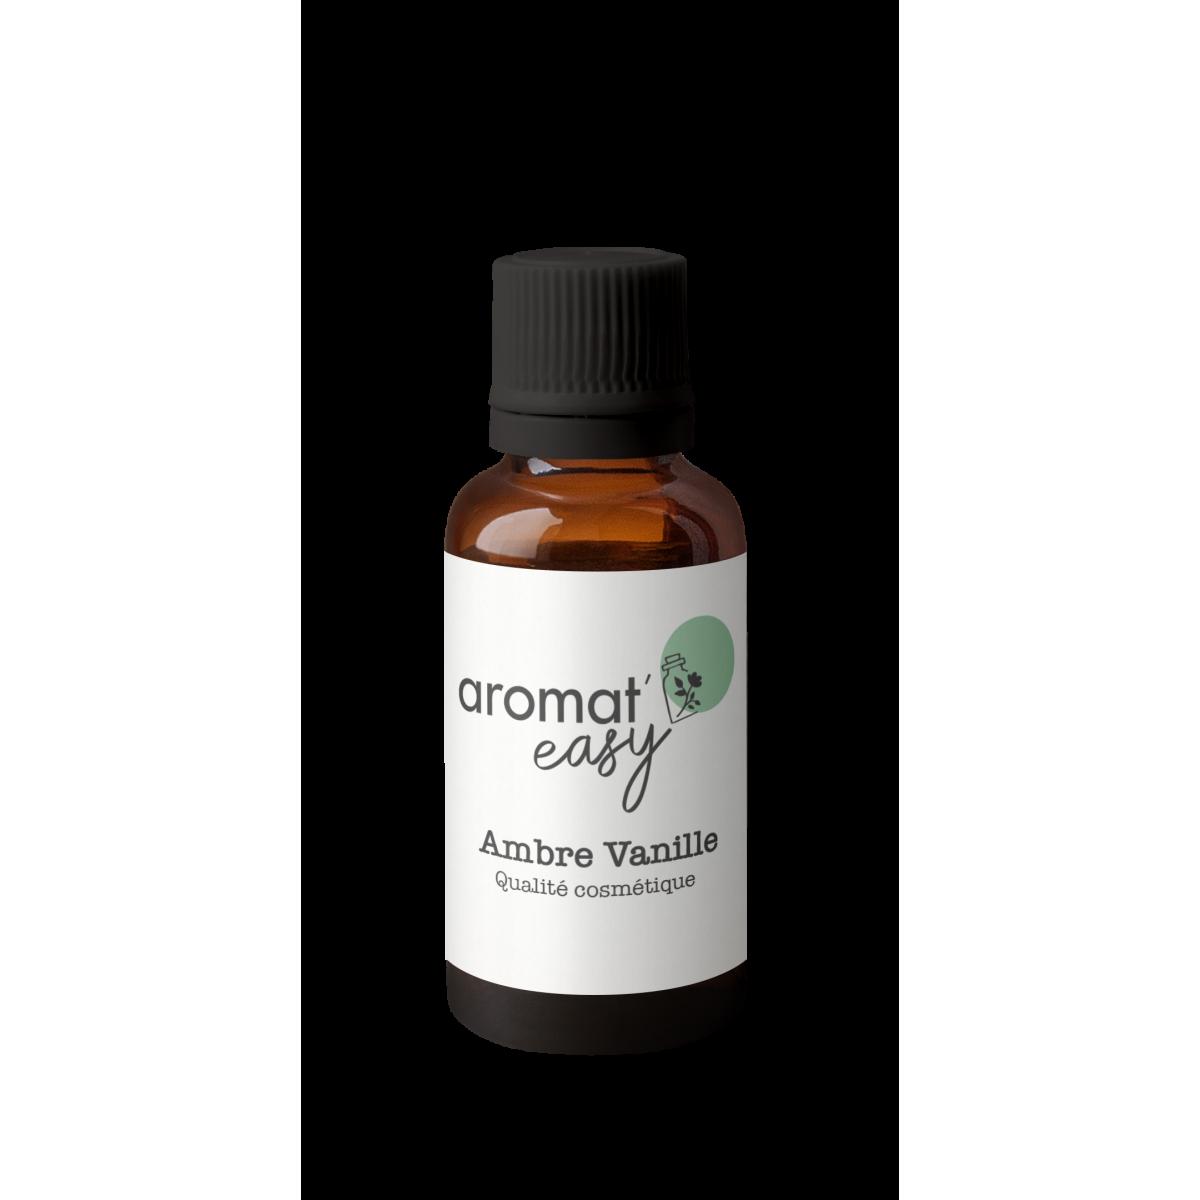 Fragrance Ambre Vanille